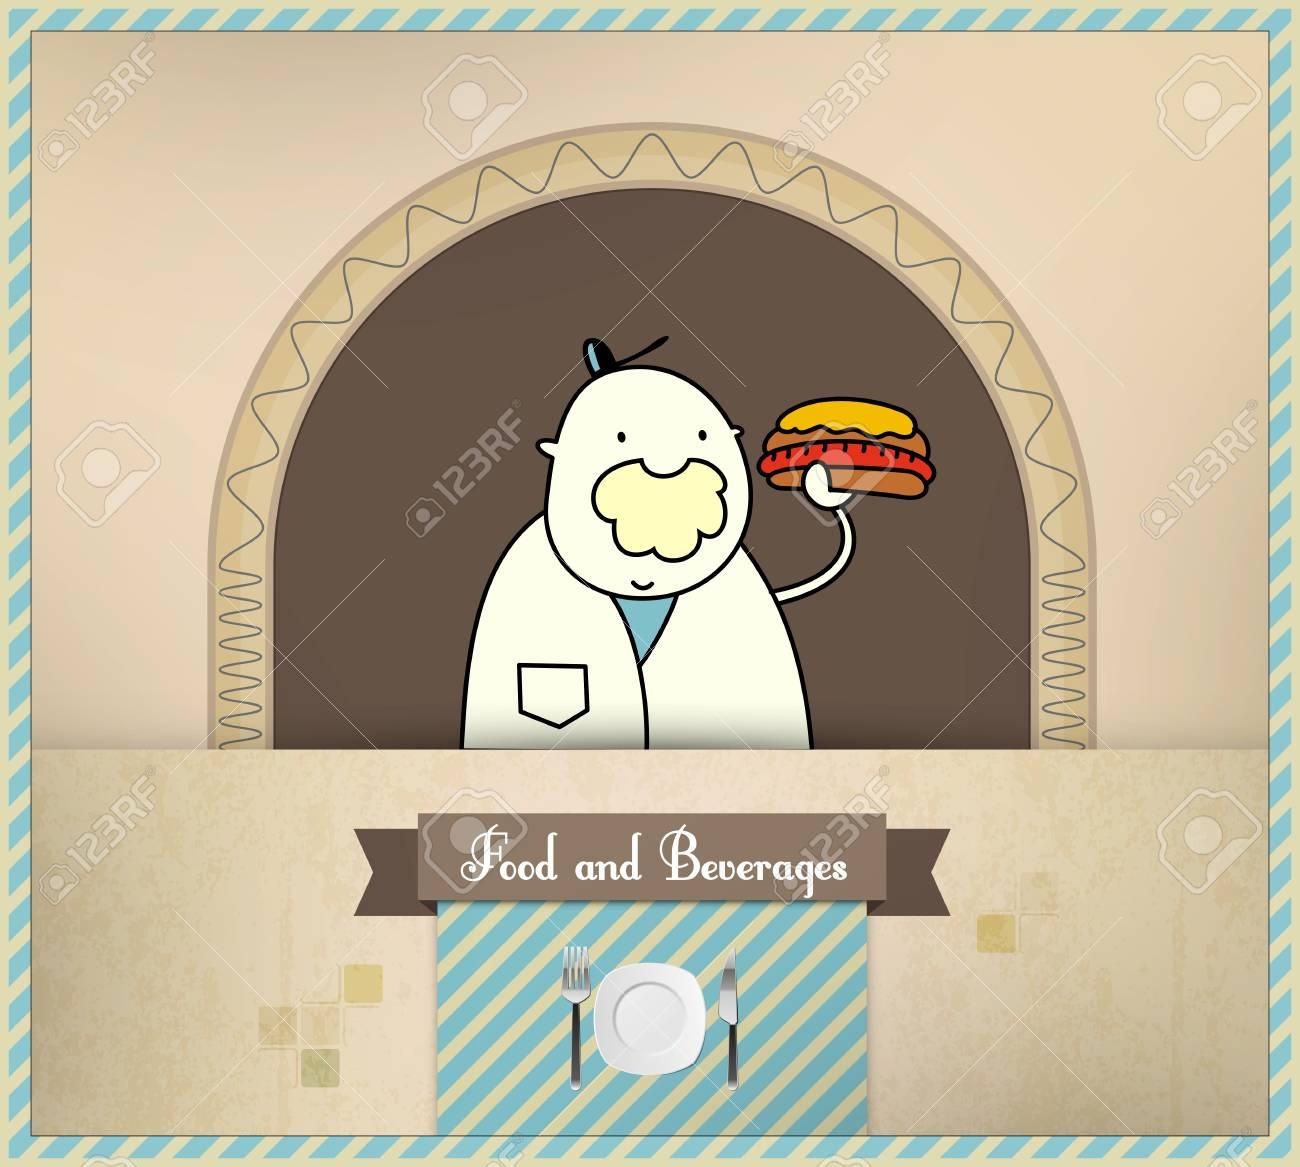 Salesman Serving Fresh Hot Dog. Food and Beverages Series. Stock Vector - 14172090